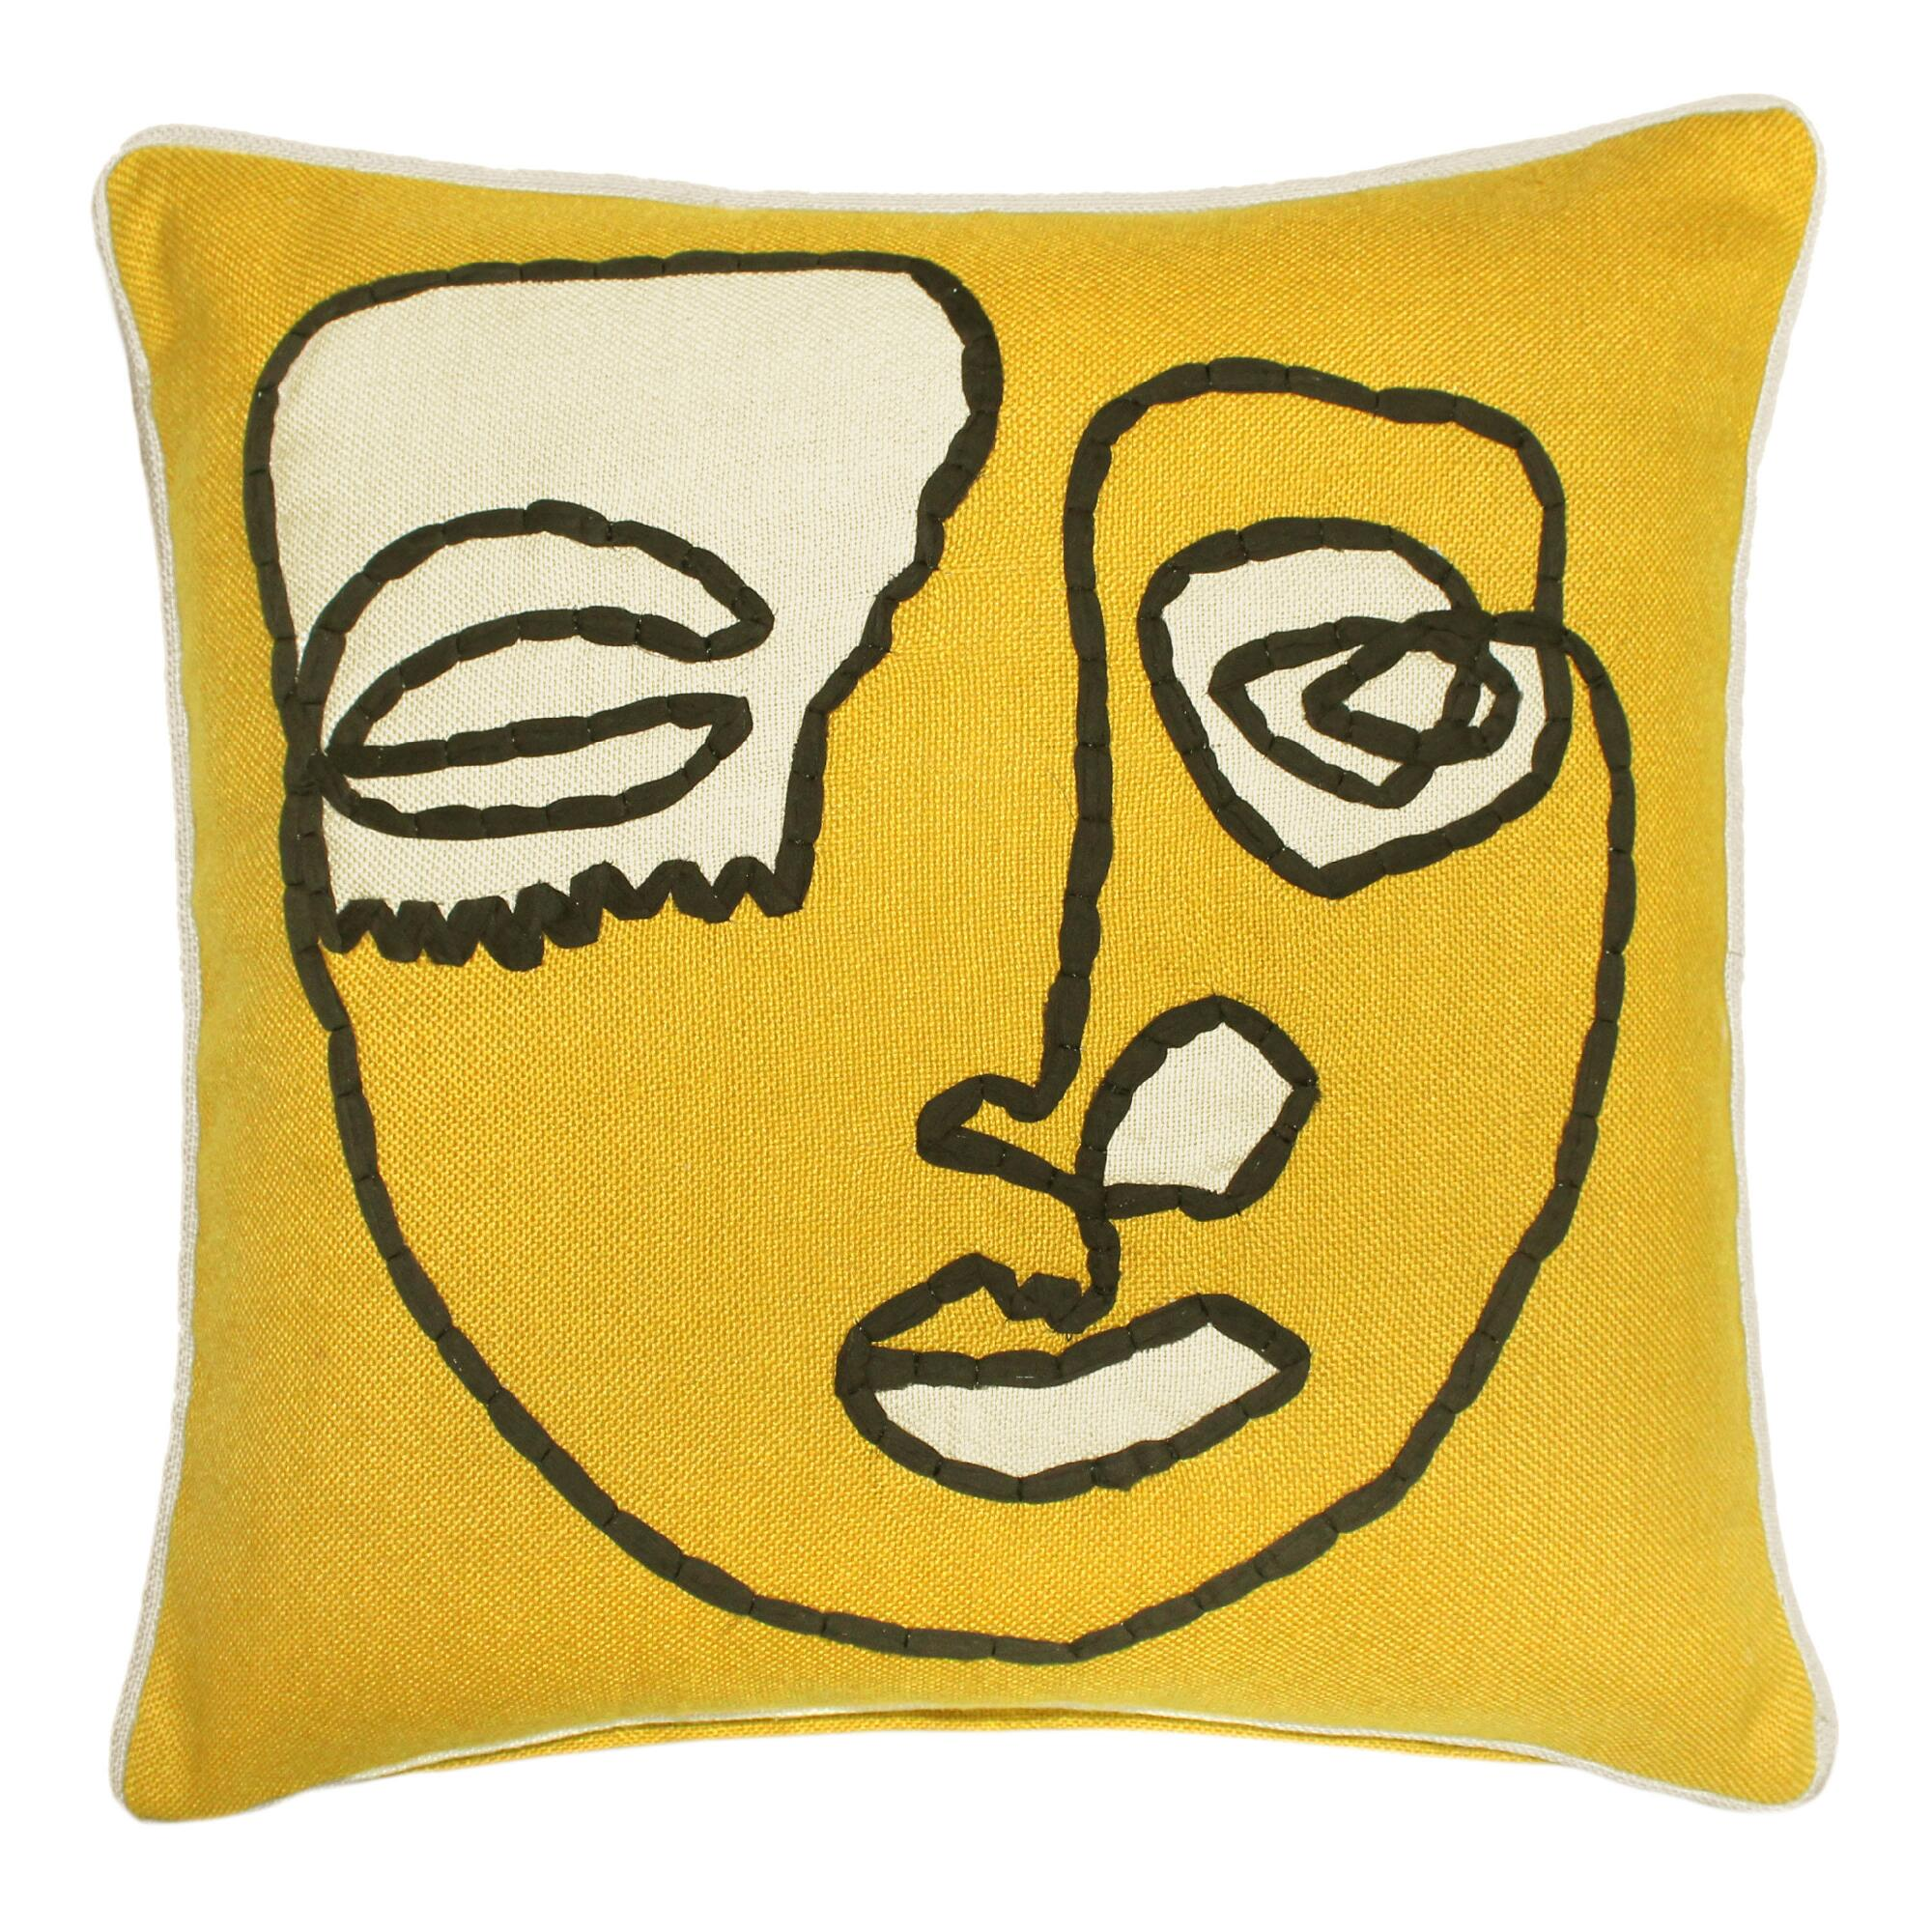 Gold Contour Face Indoor Outdoor Throw Pillow $29.99